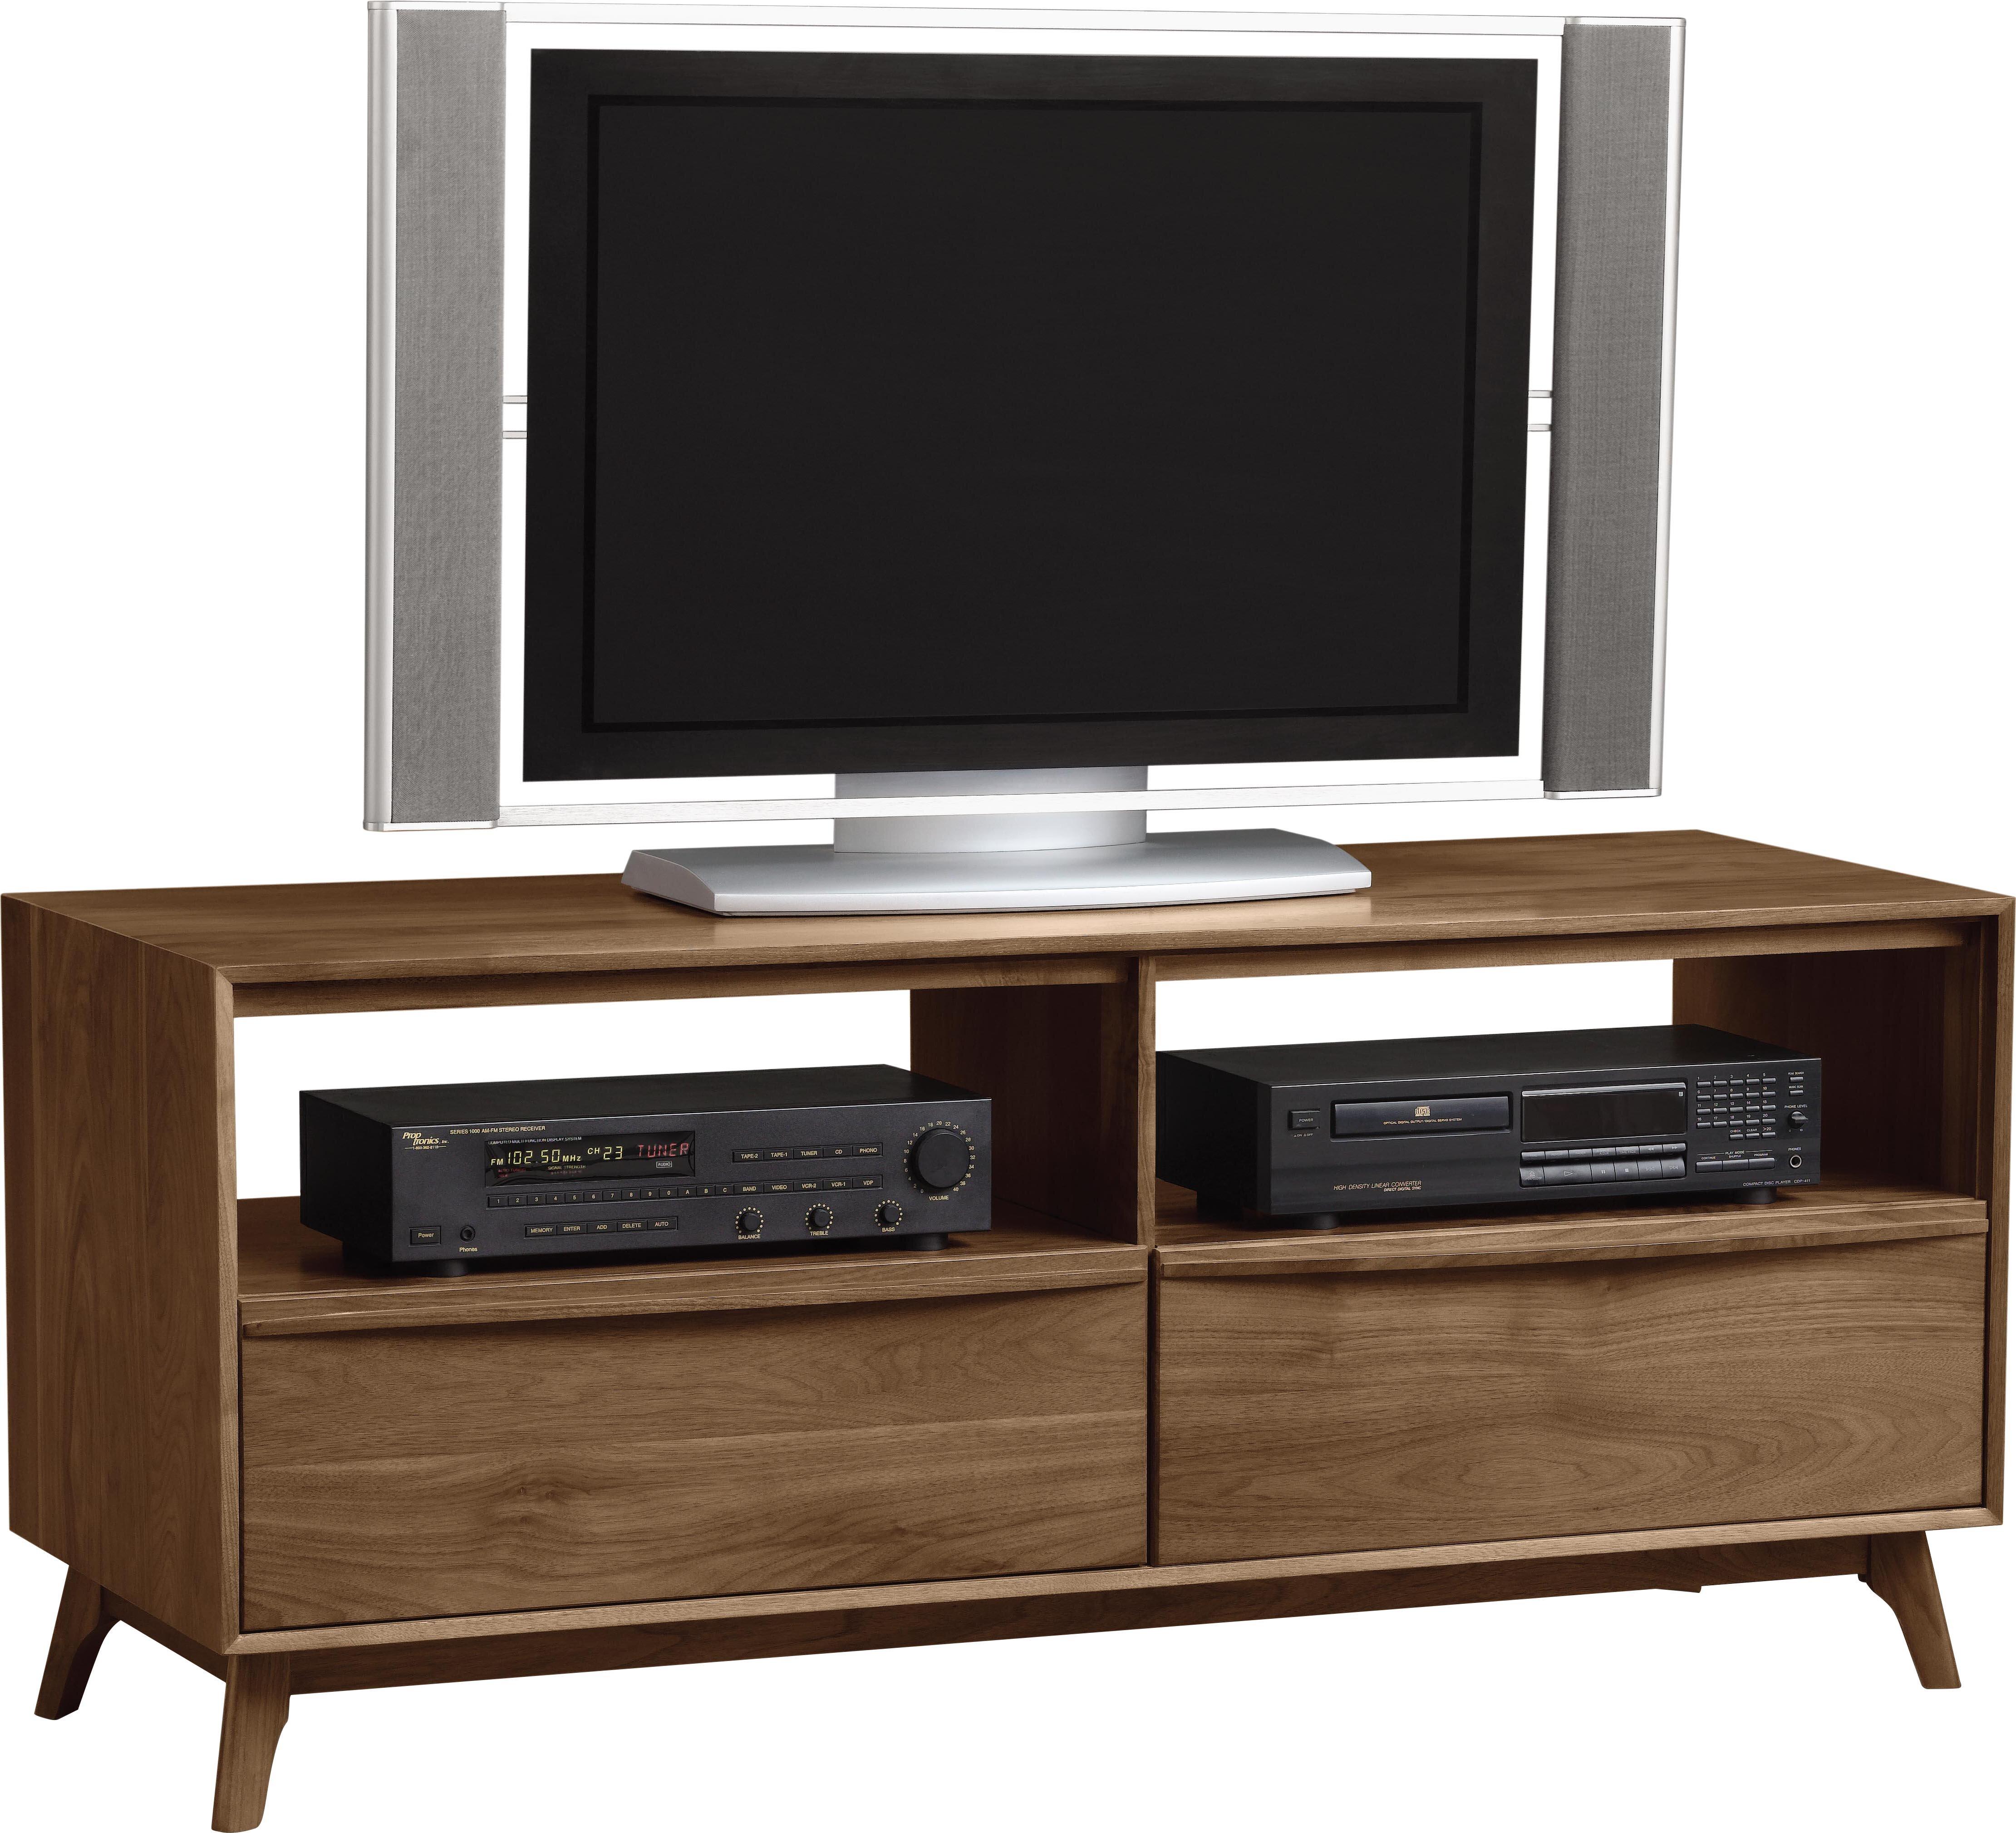 Copeland Furniture Catalina 53 66 TV Stand